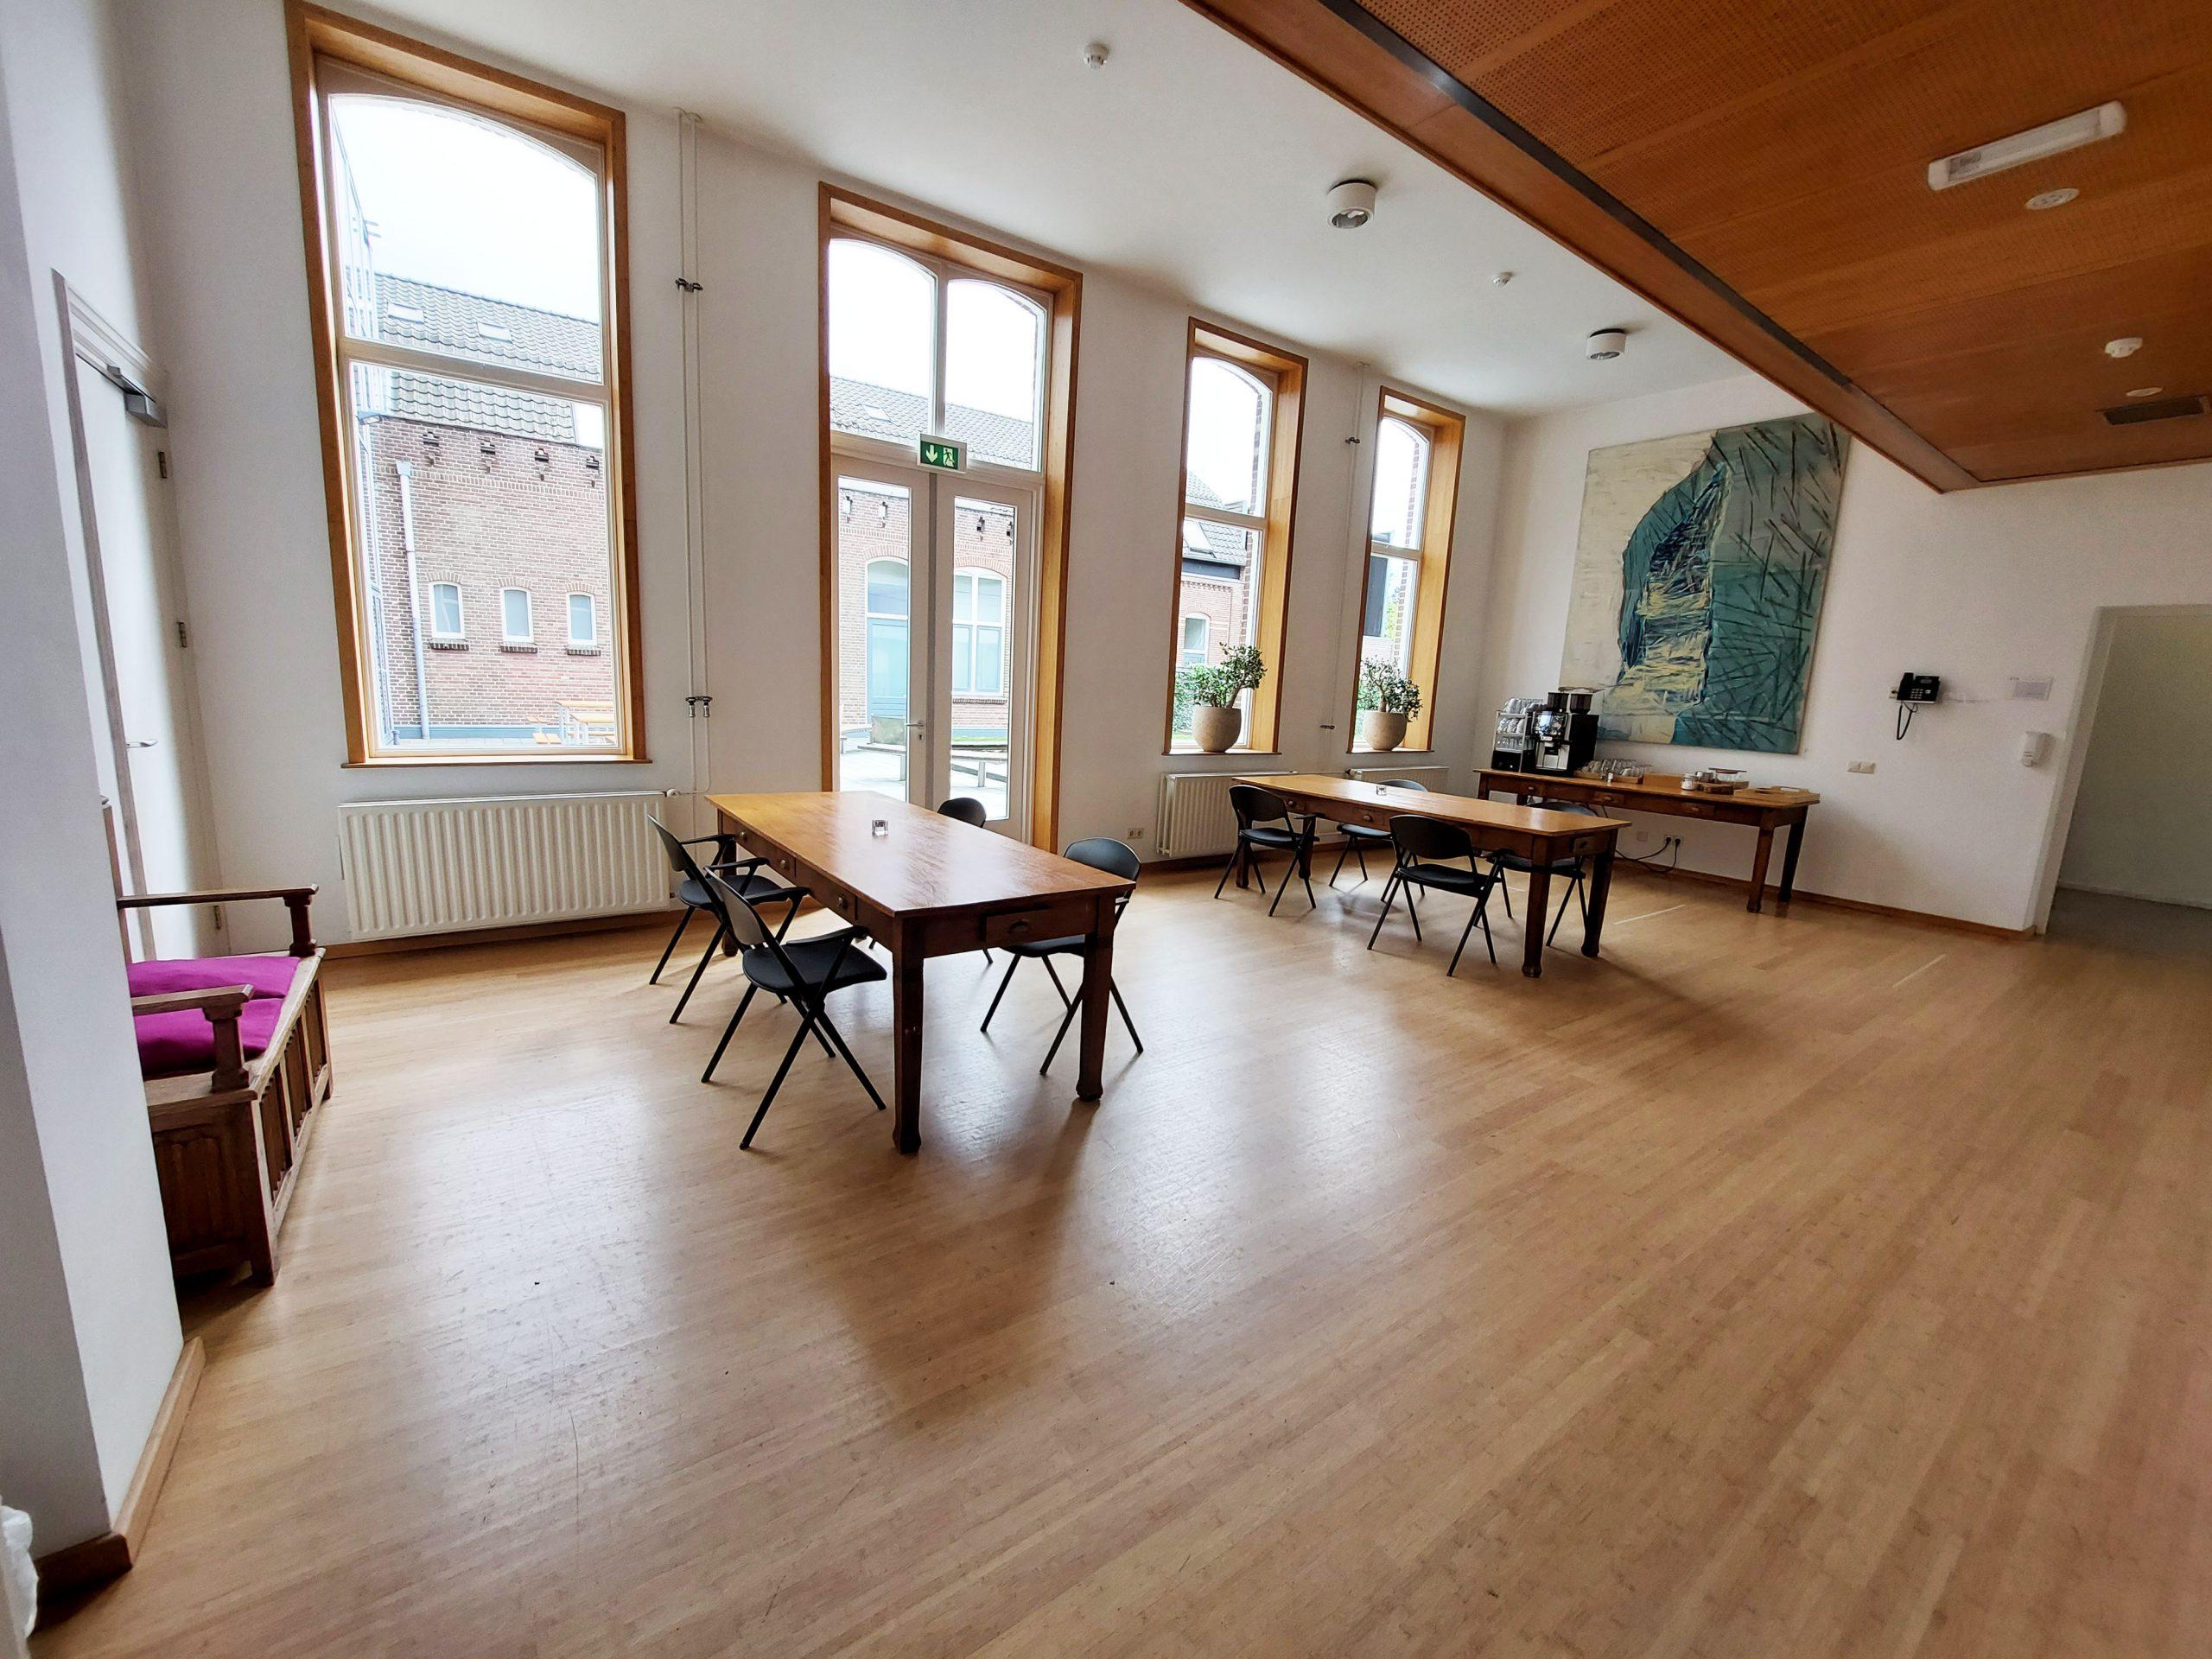 Foyer voorkamer Tuinkamer koffie drinken thee algemene ruimte